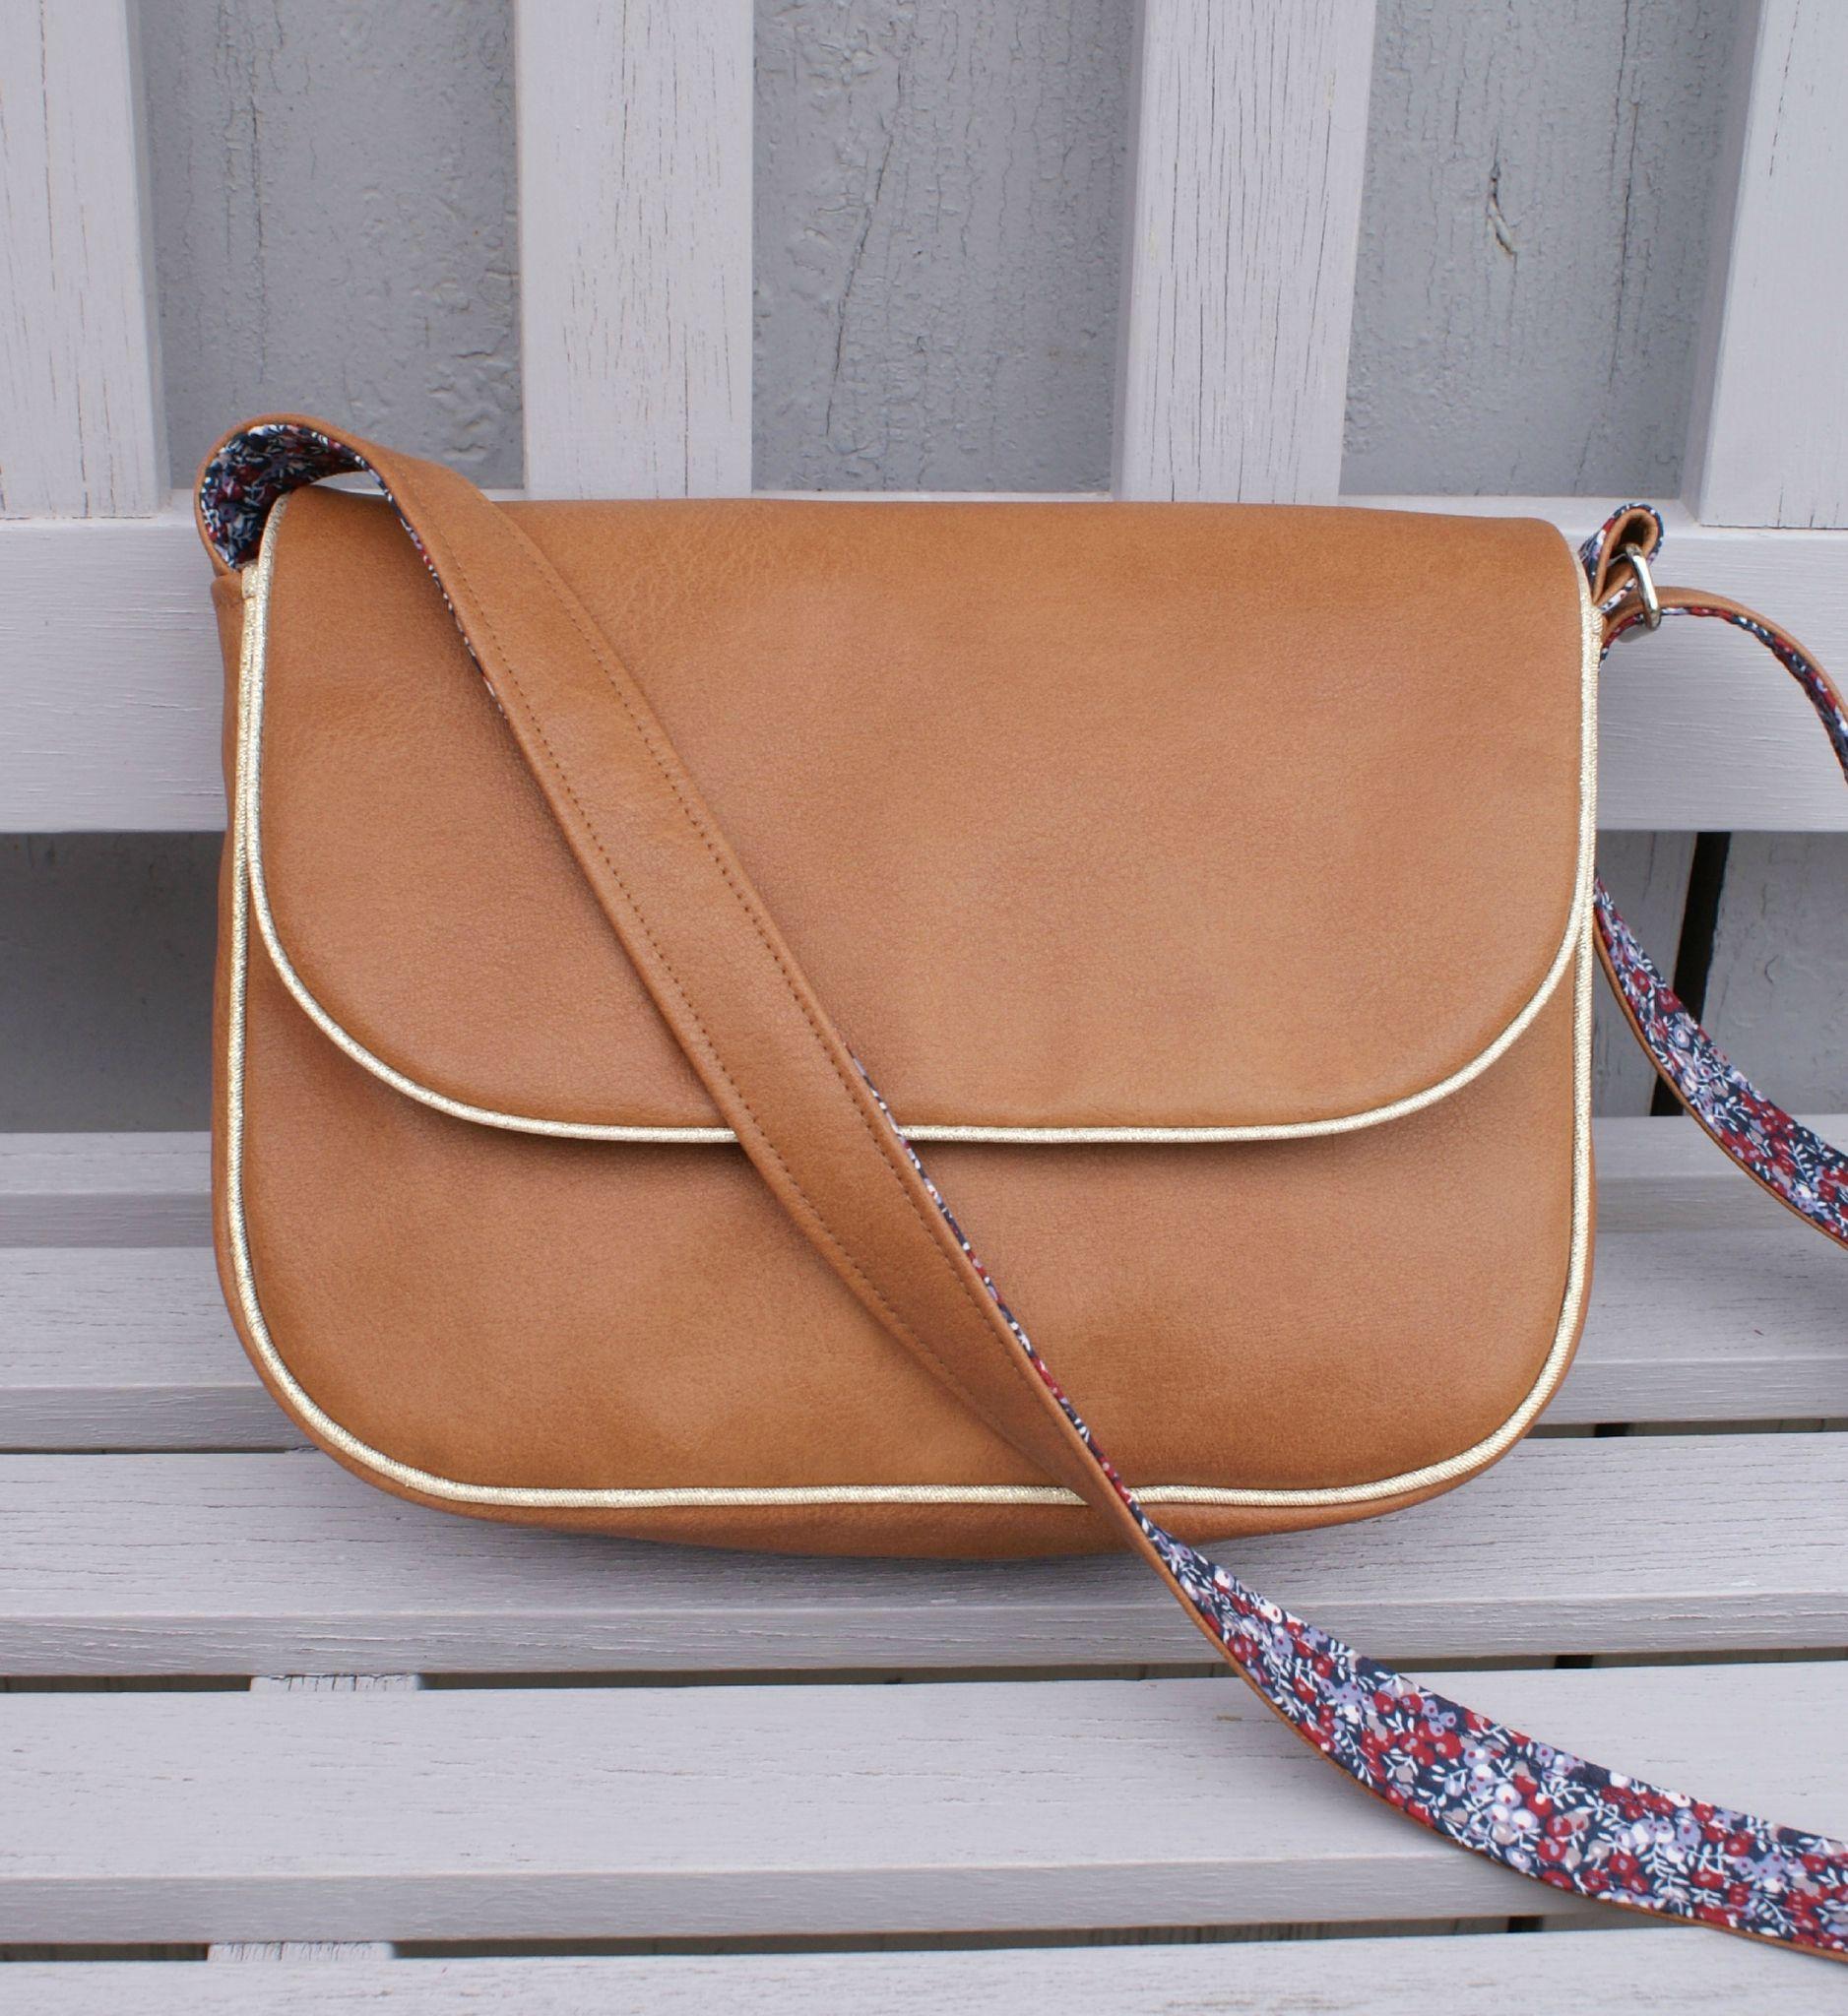 Tuto mini sam camel wilmslow berry couture sac trousse pinterest sac main - Couture sac a main ...